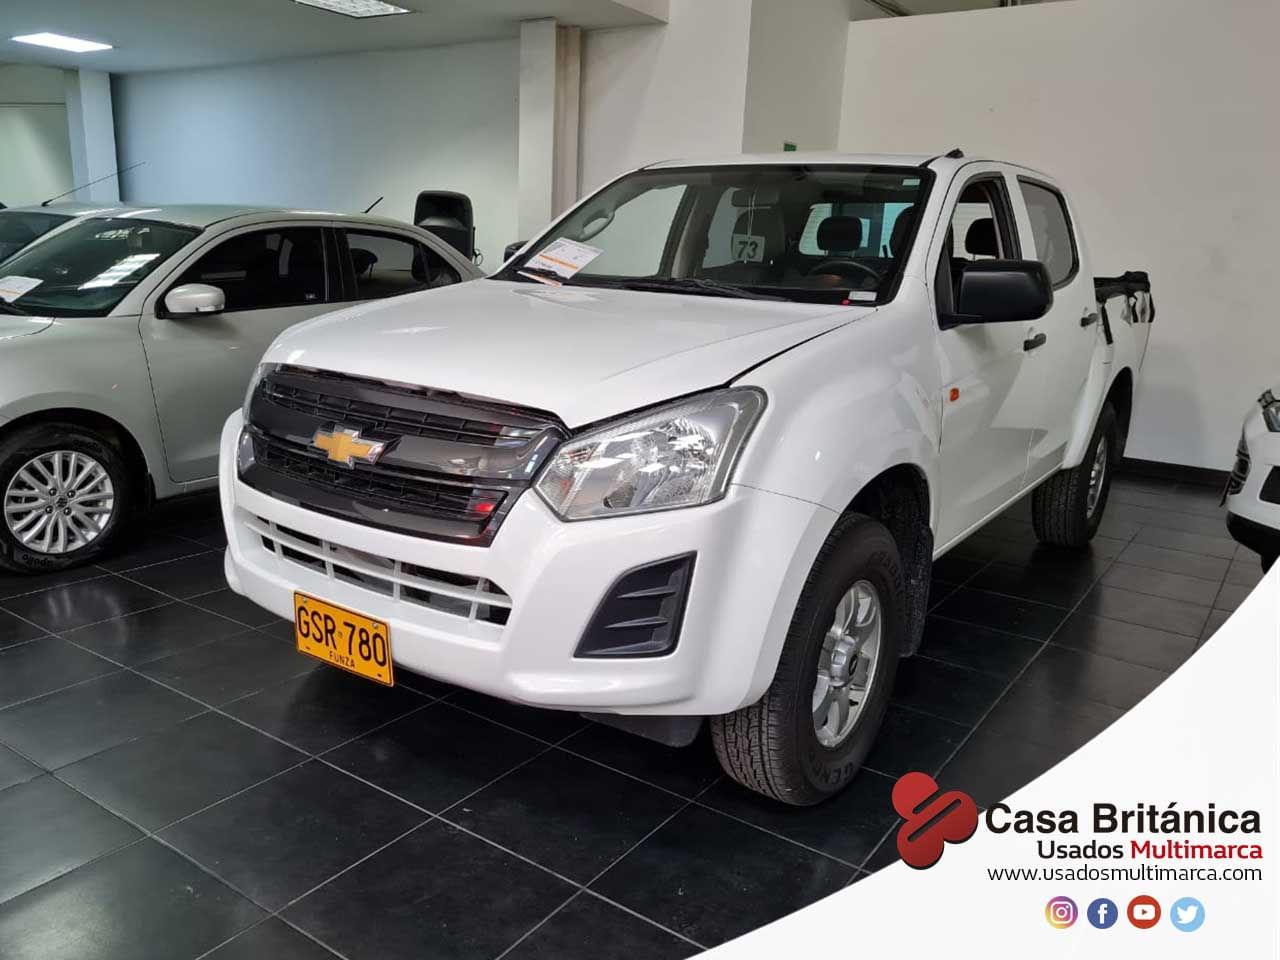 Chevrolet-Luv-Dmax-dsl-01498298-1